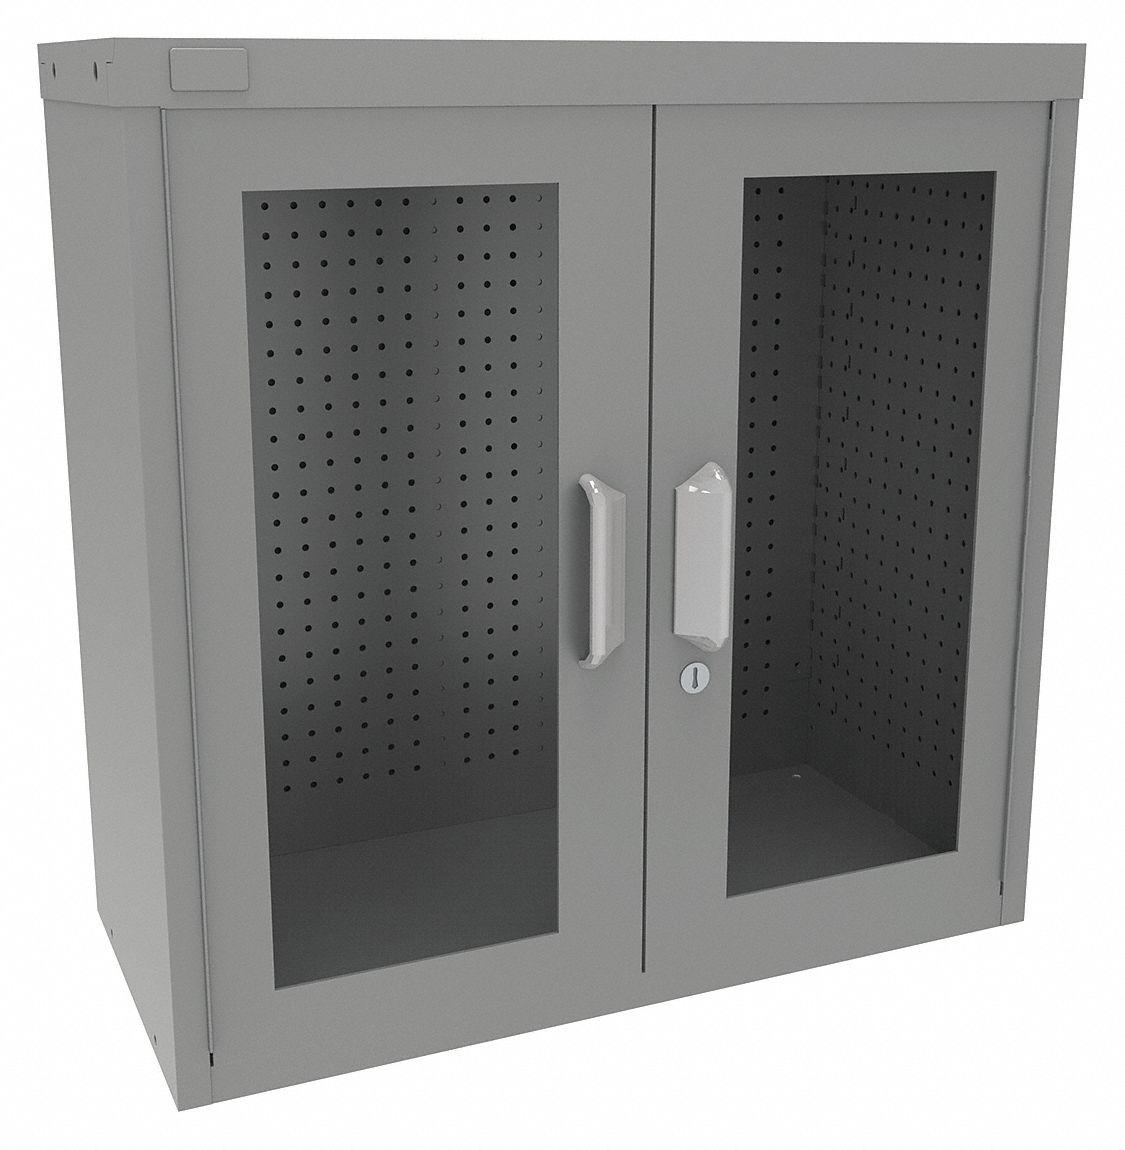 Pegboard Storage Cabinets